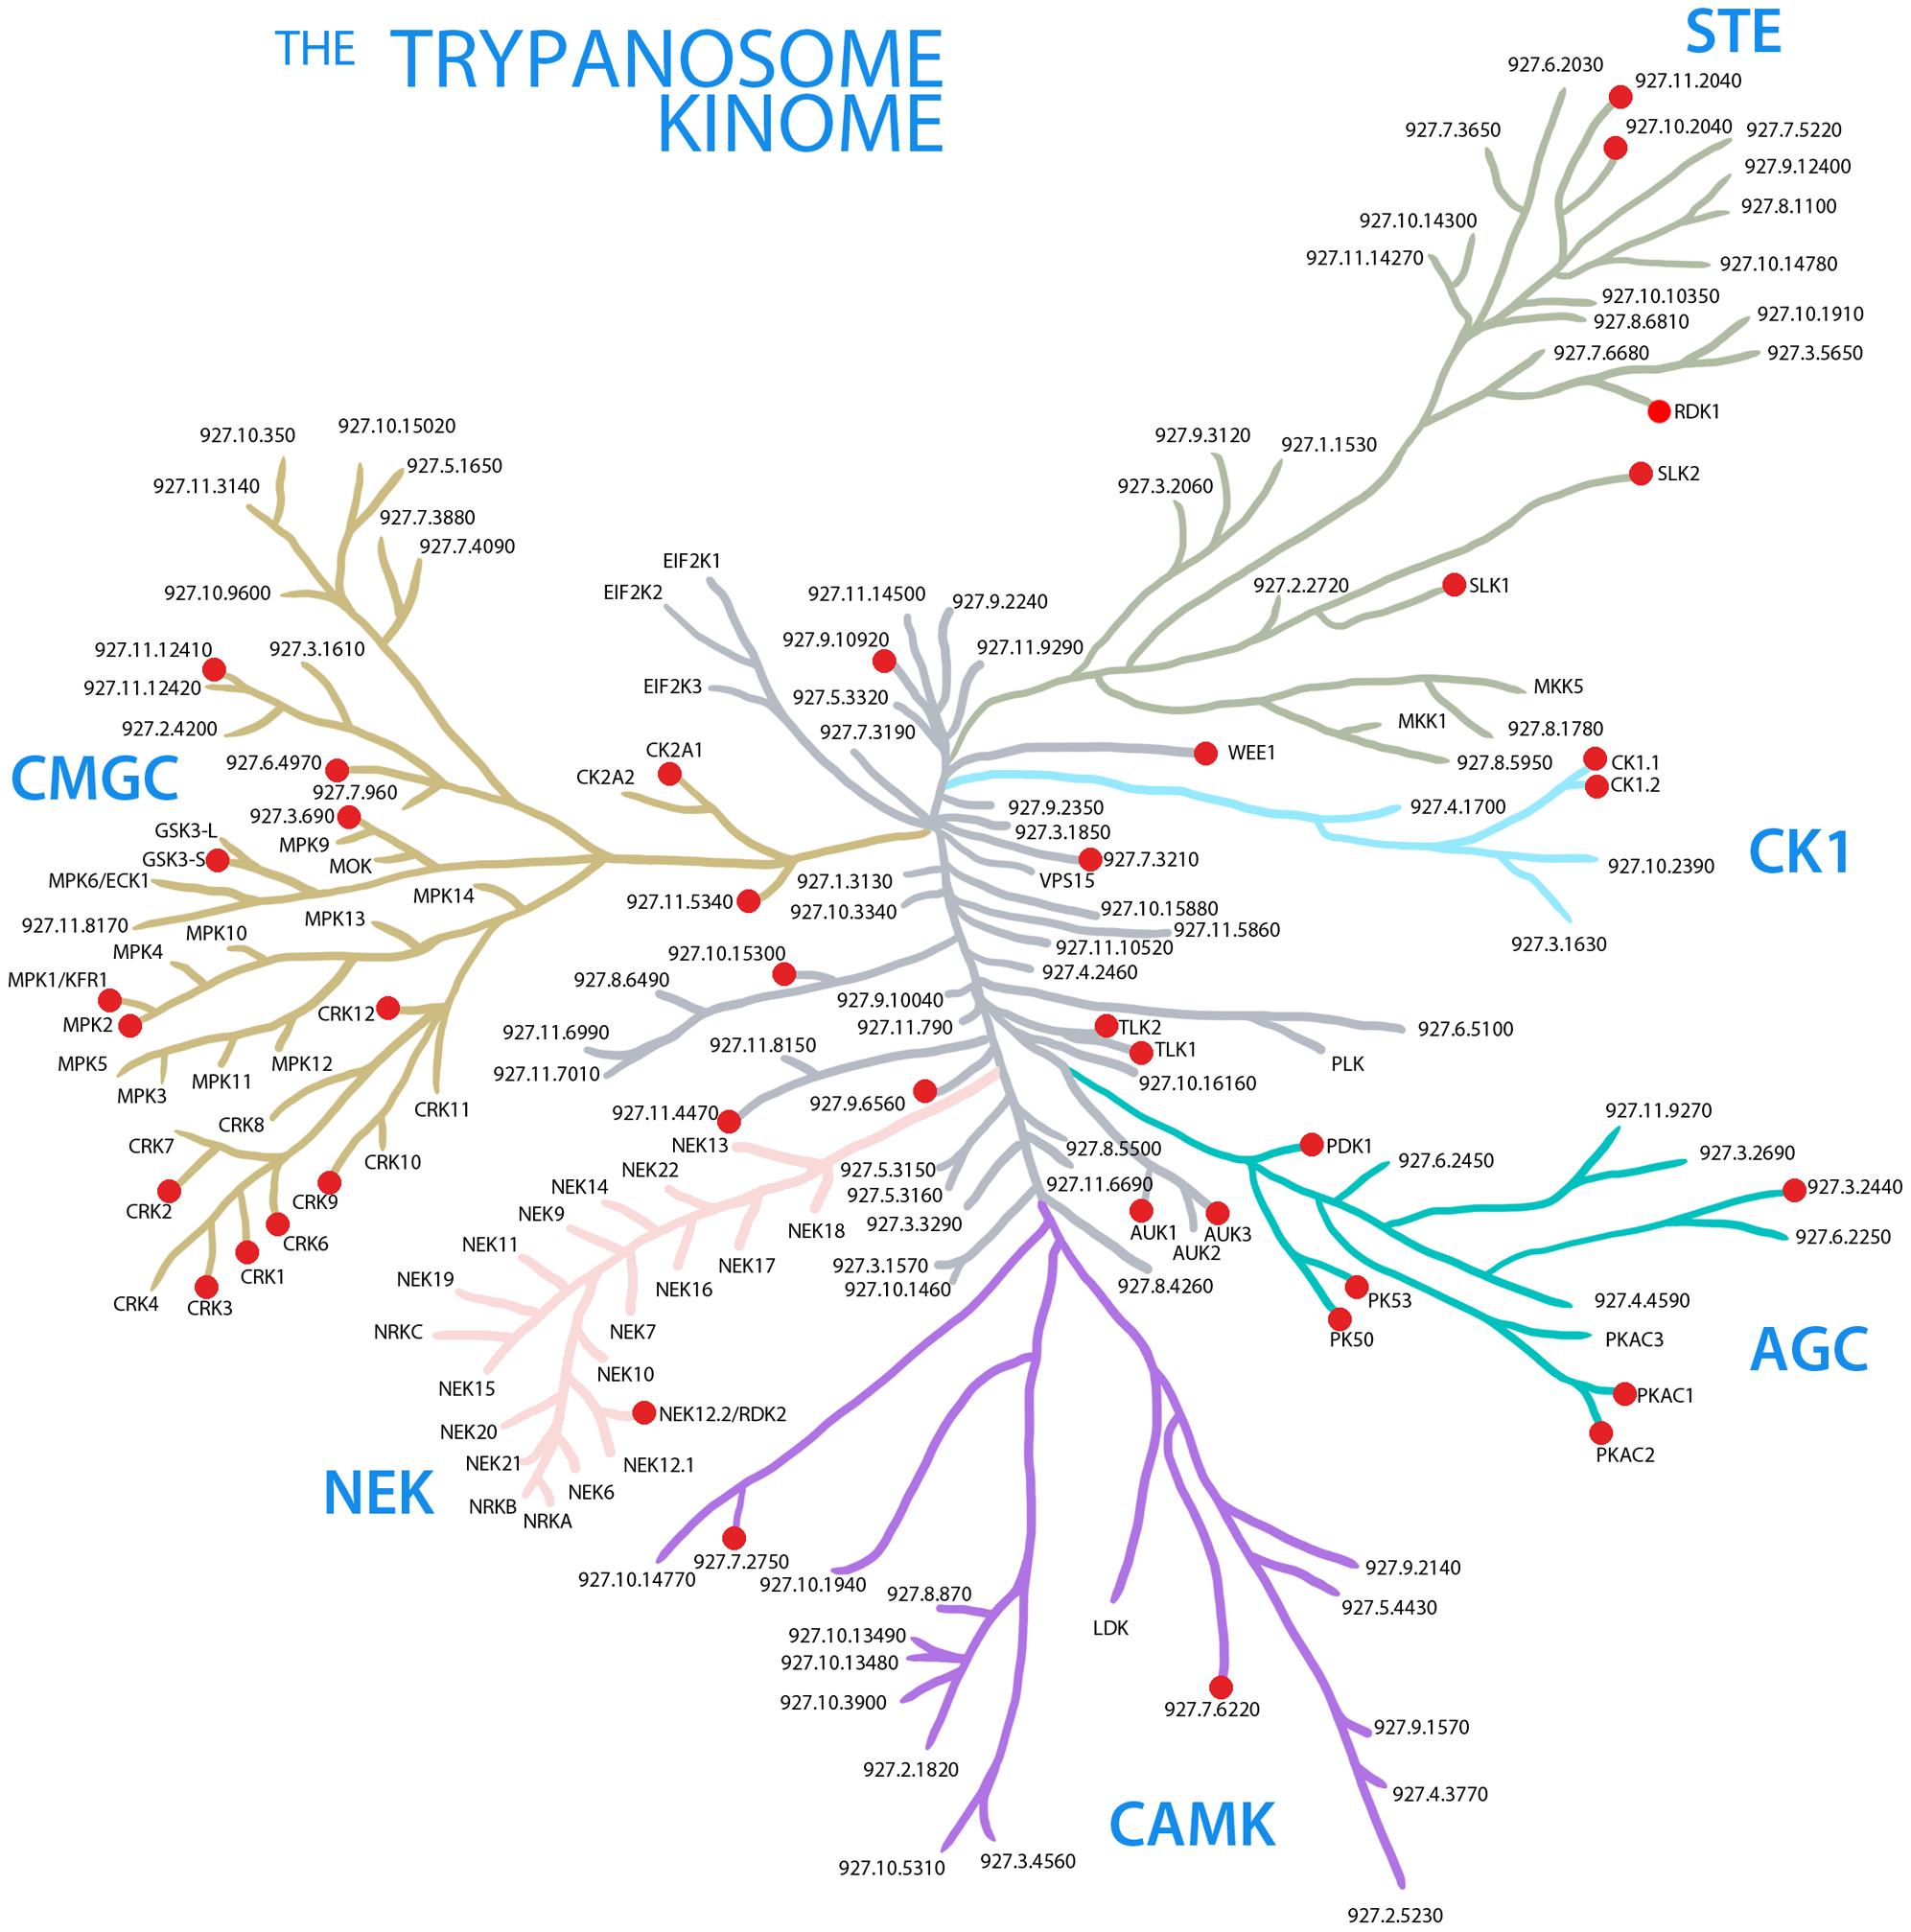 The trypanosome kinome.